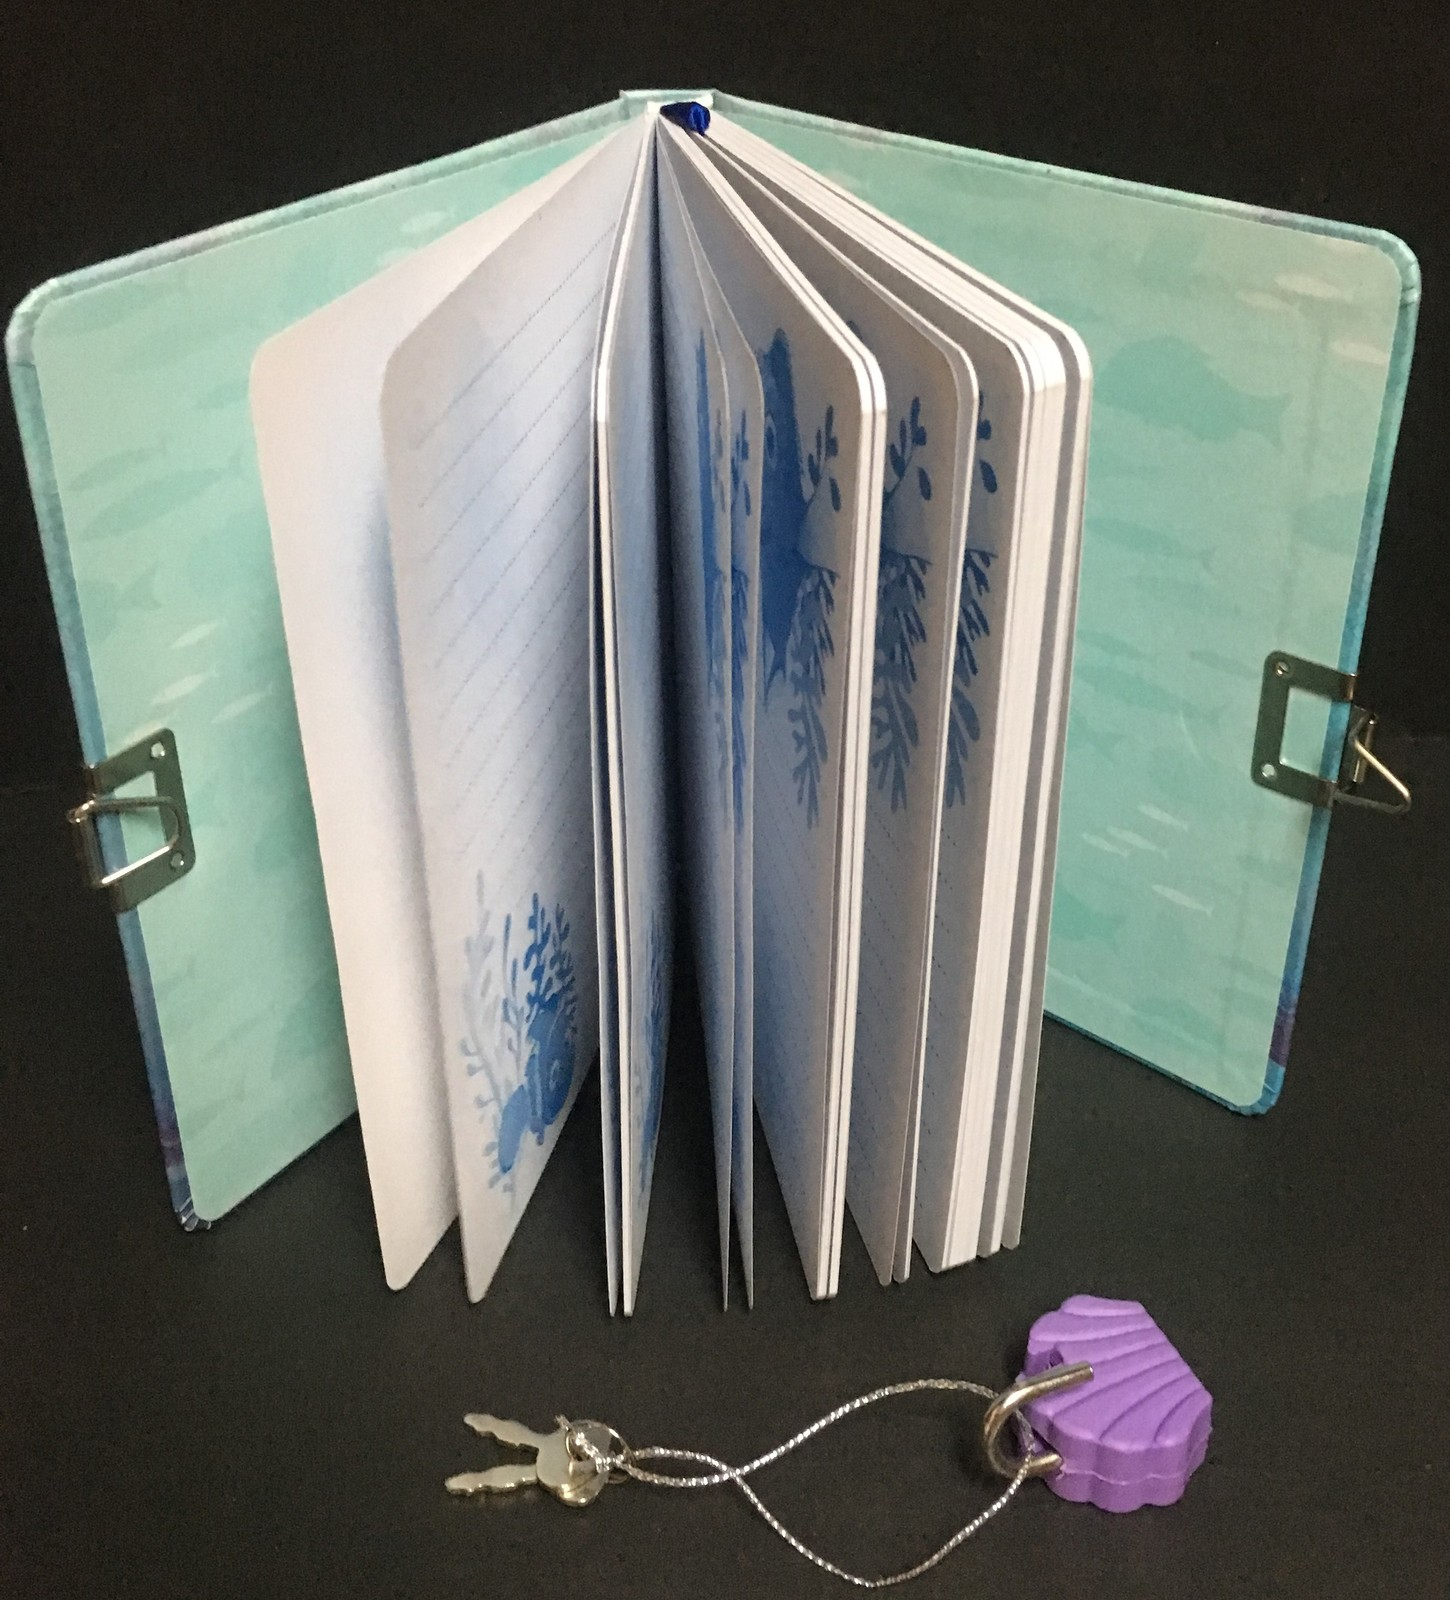 Finding Dory An Ocean of Adventure Lock & Key Diary